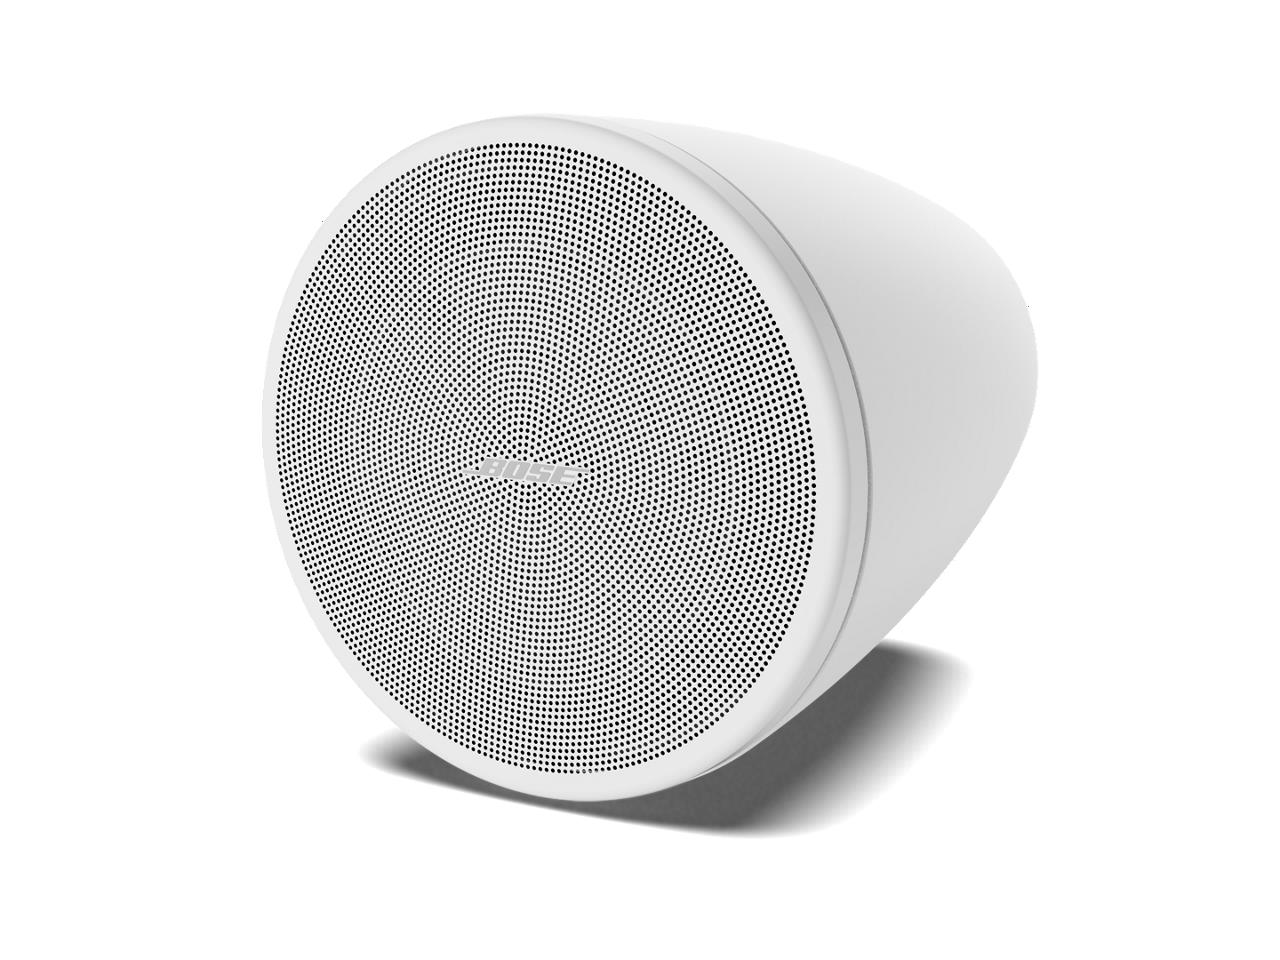 Loa Bose DesignMax DM3P 4